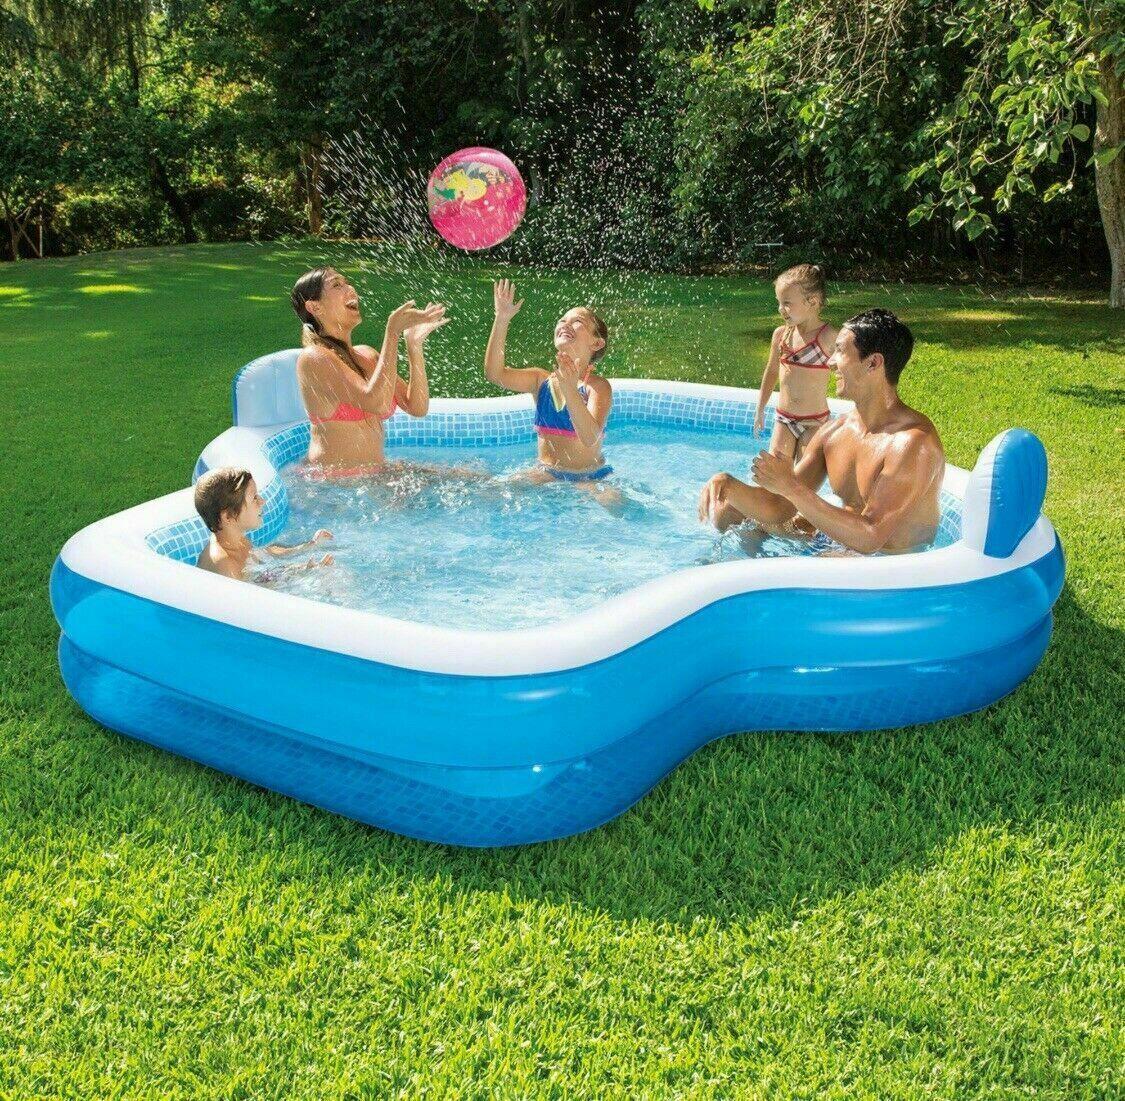 "Member's Mark Mosaic INFLATABLE Family Pool 10 Feet Long 120"" x 110"" x 18"" Seat"